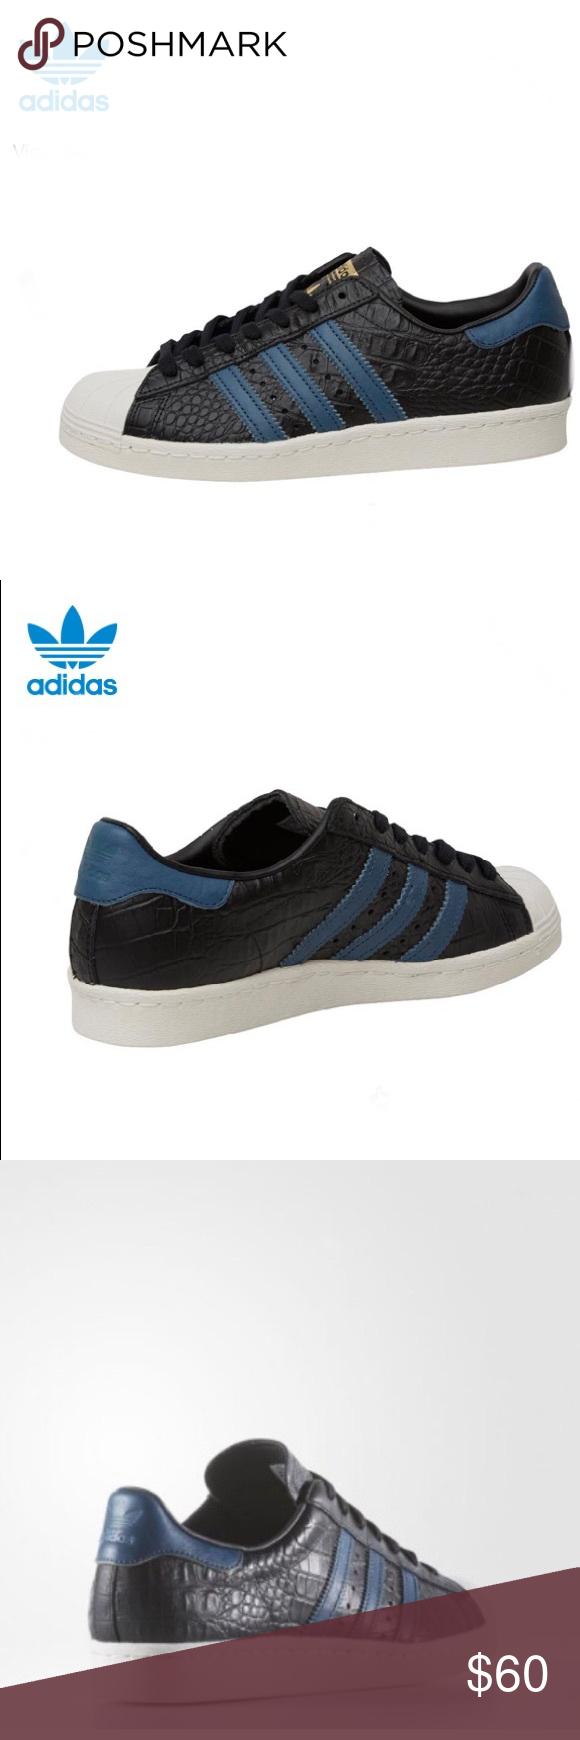 buy popular 9b4bf 08433 Adidas Superstar 80s Shoes Men's Core Black Adidas Superstar ...